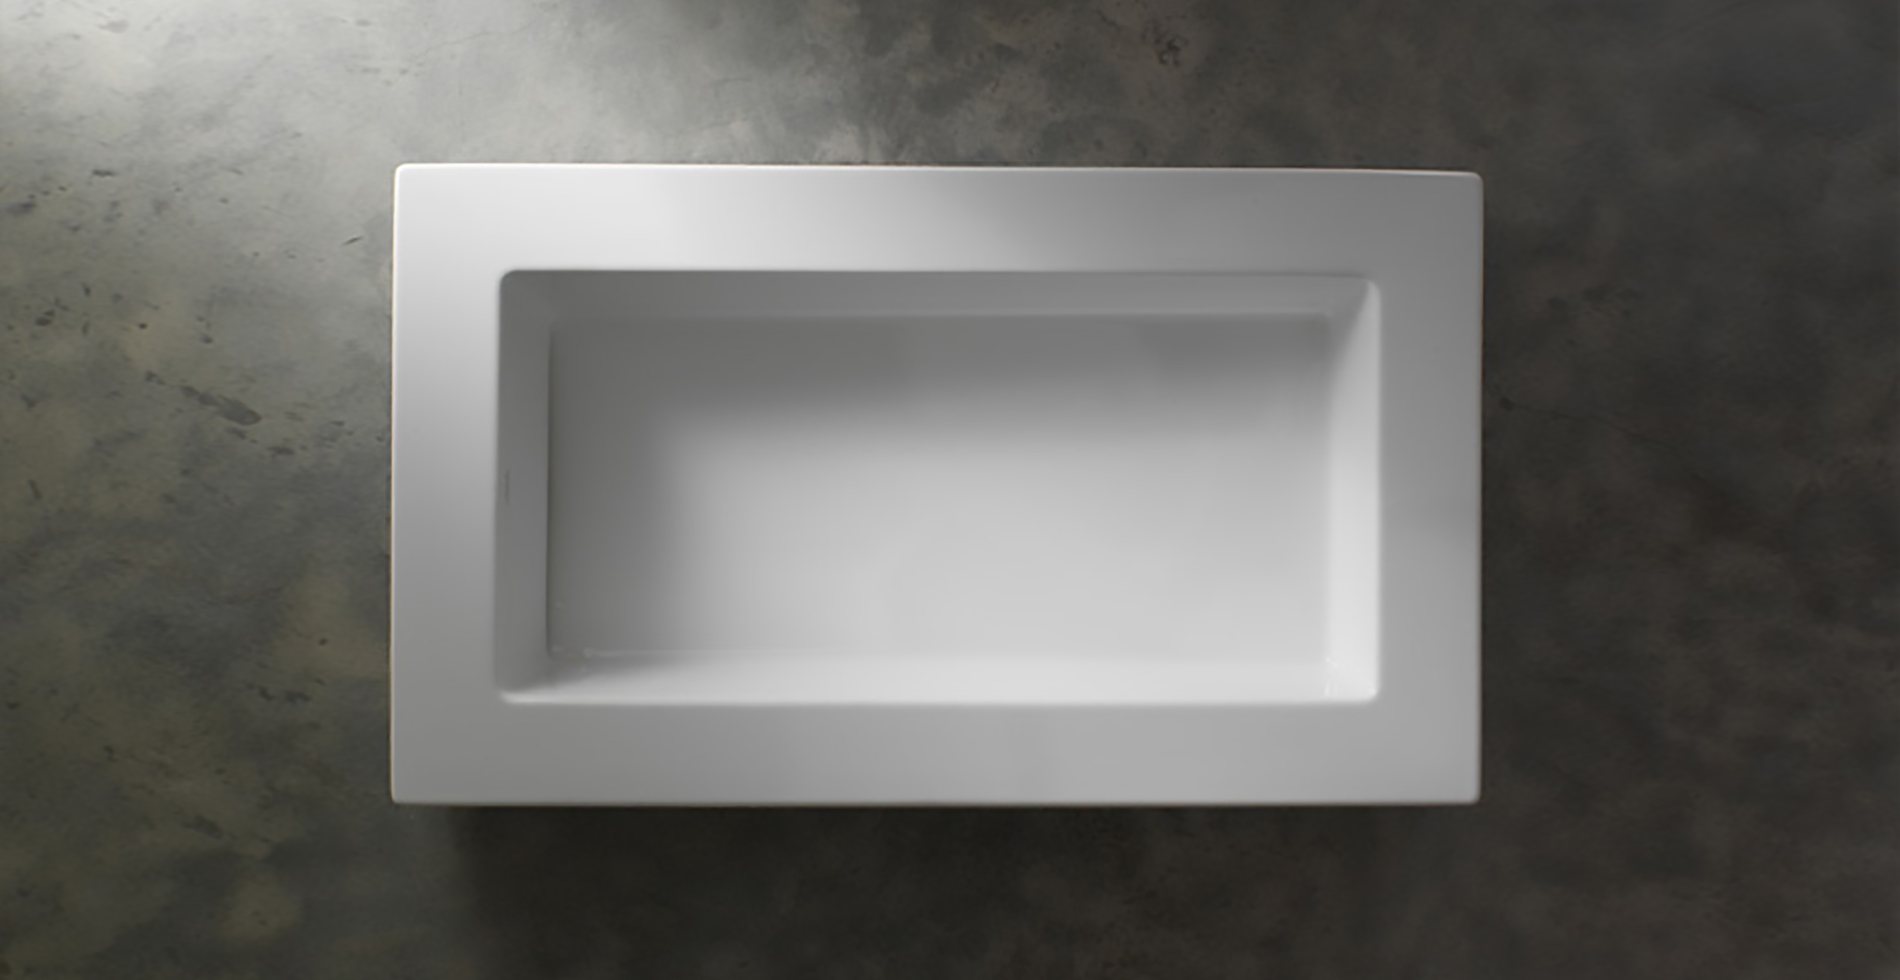 SpaceFree ceramic washbasin - bathroom deco   Design Antonio Pascale for Ceramica Globo